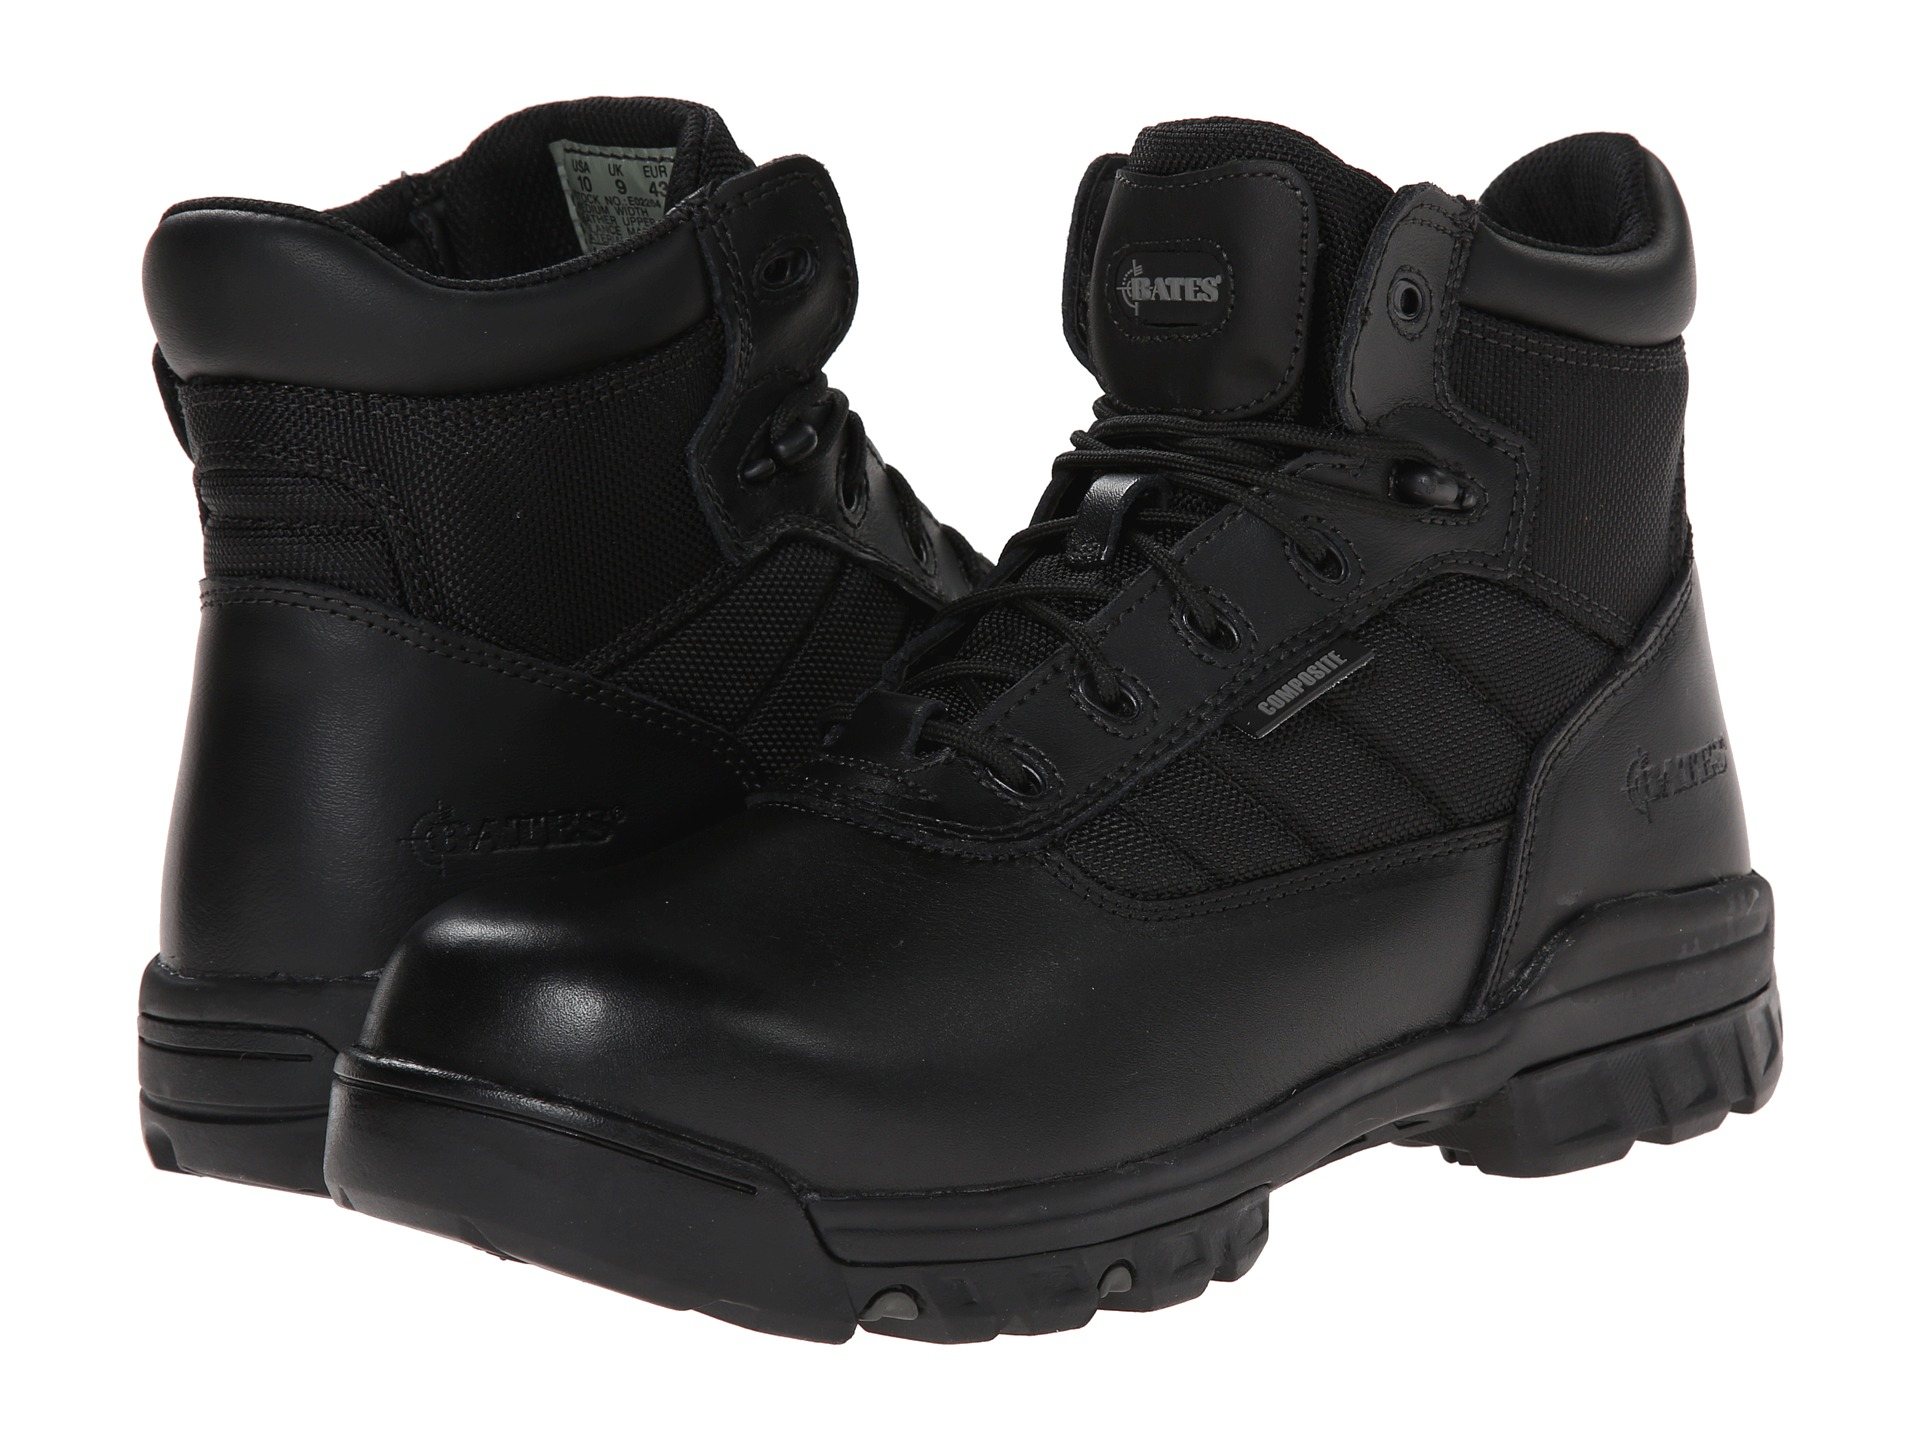 Bates Footwear 5 Quot Tactical Sport Composite Toe Side Zip At